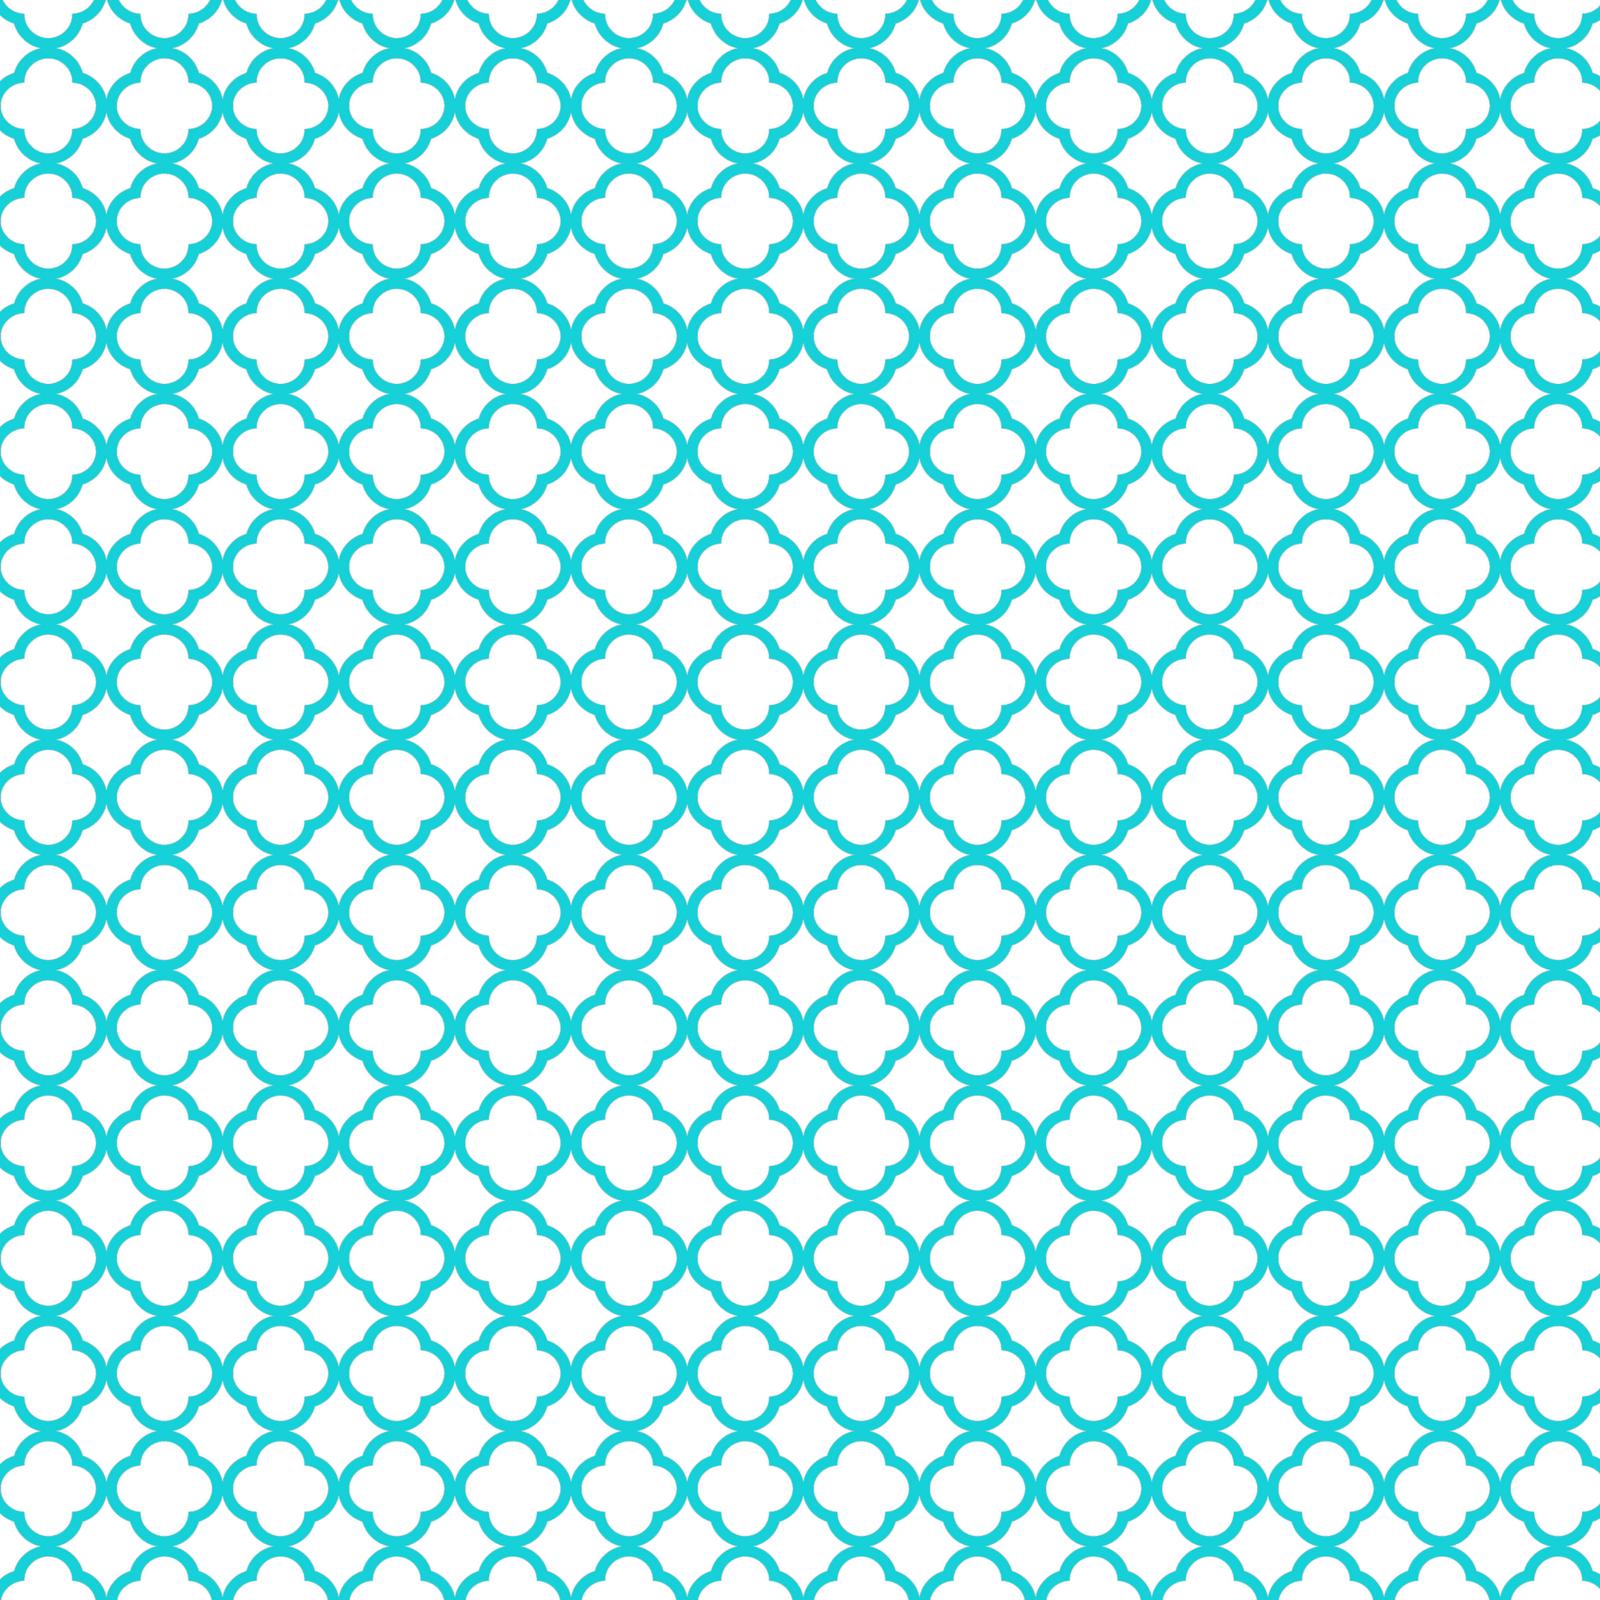 Doodle Craft: More Free Printable Patterns! | Blog Land | Pattern - Free Printable Patterns